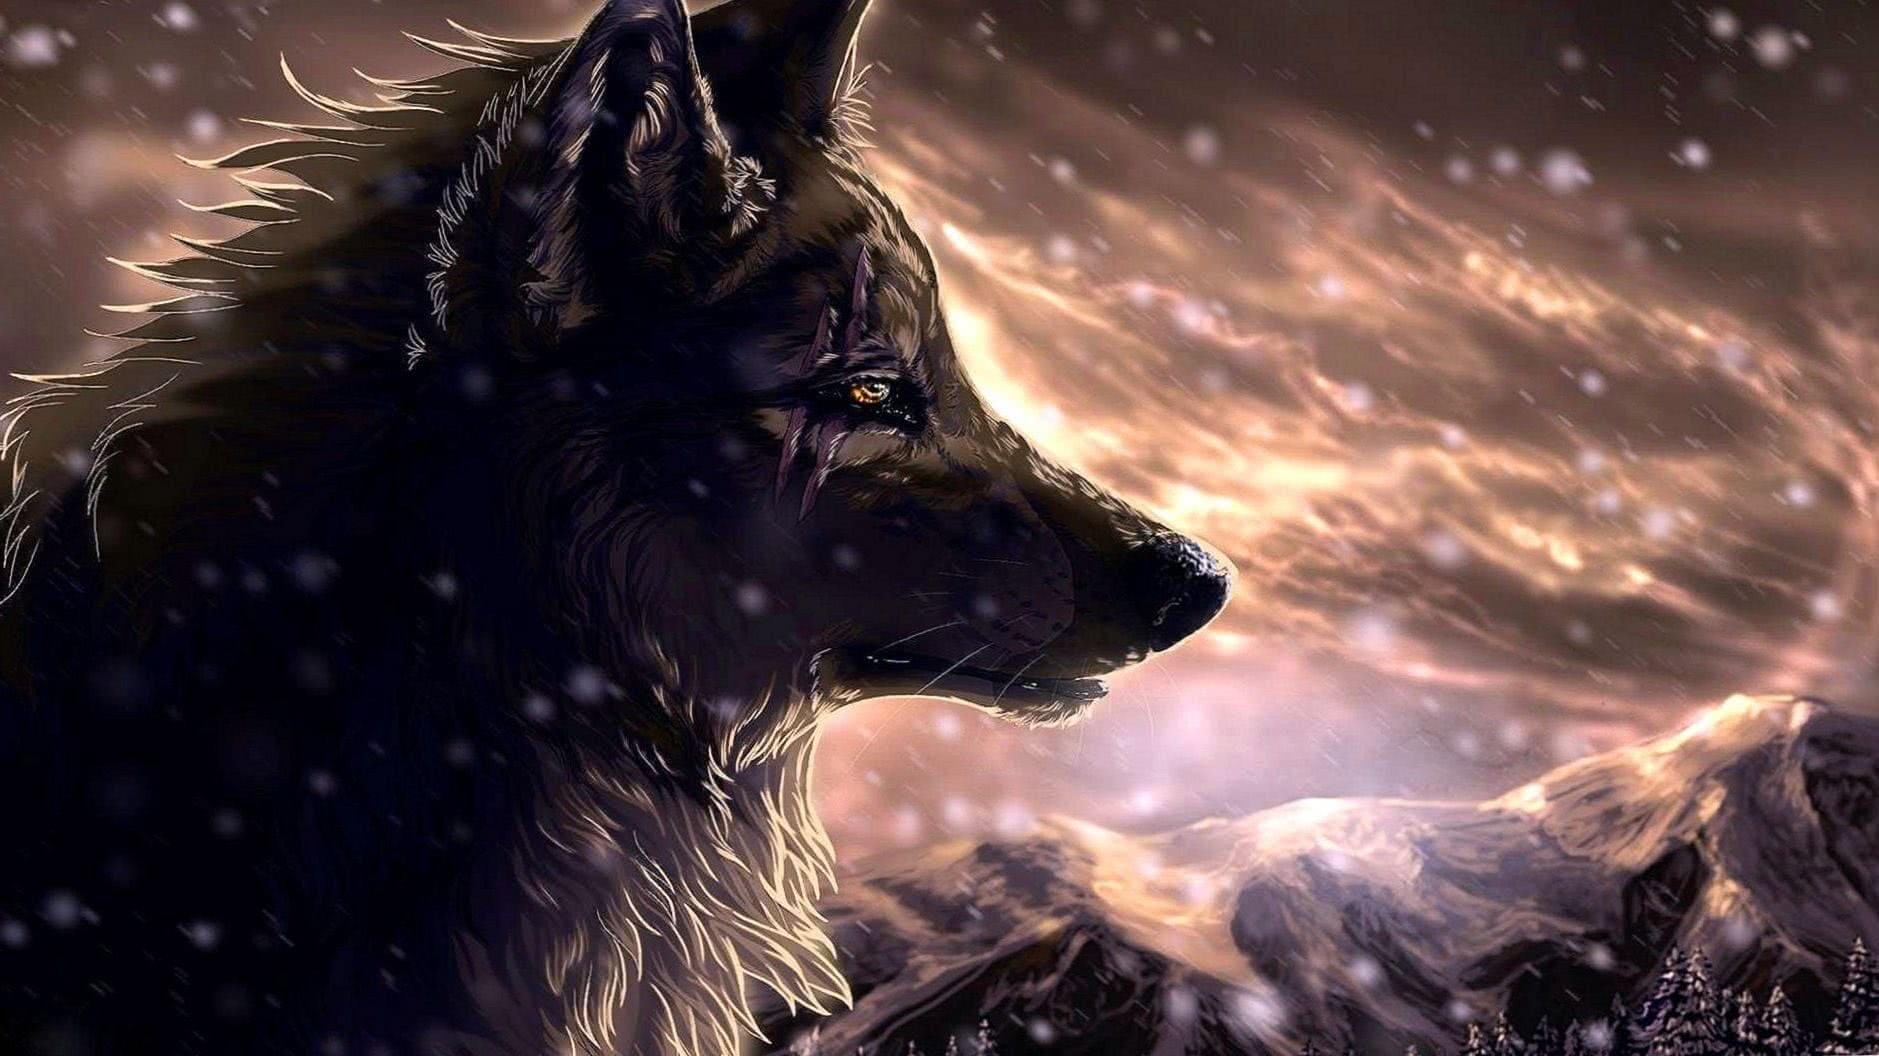 Cool HD Wallpaper Wolf